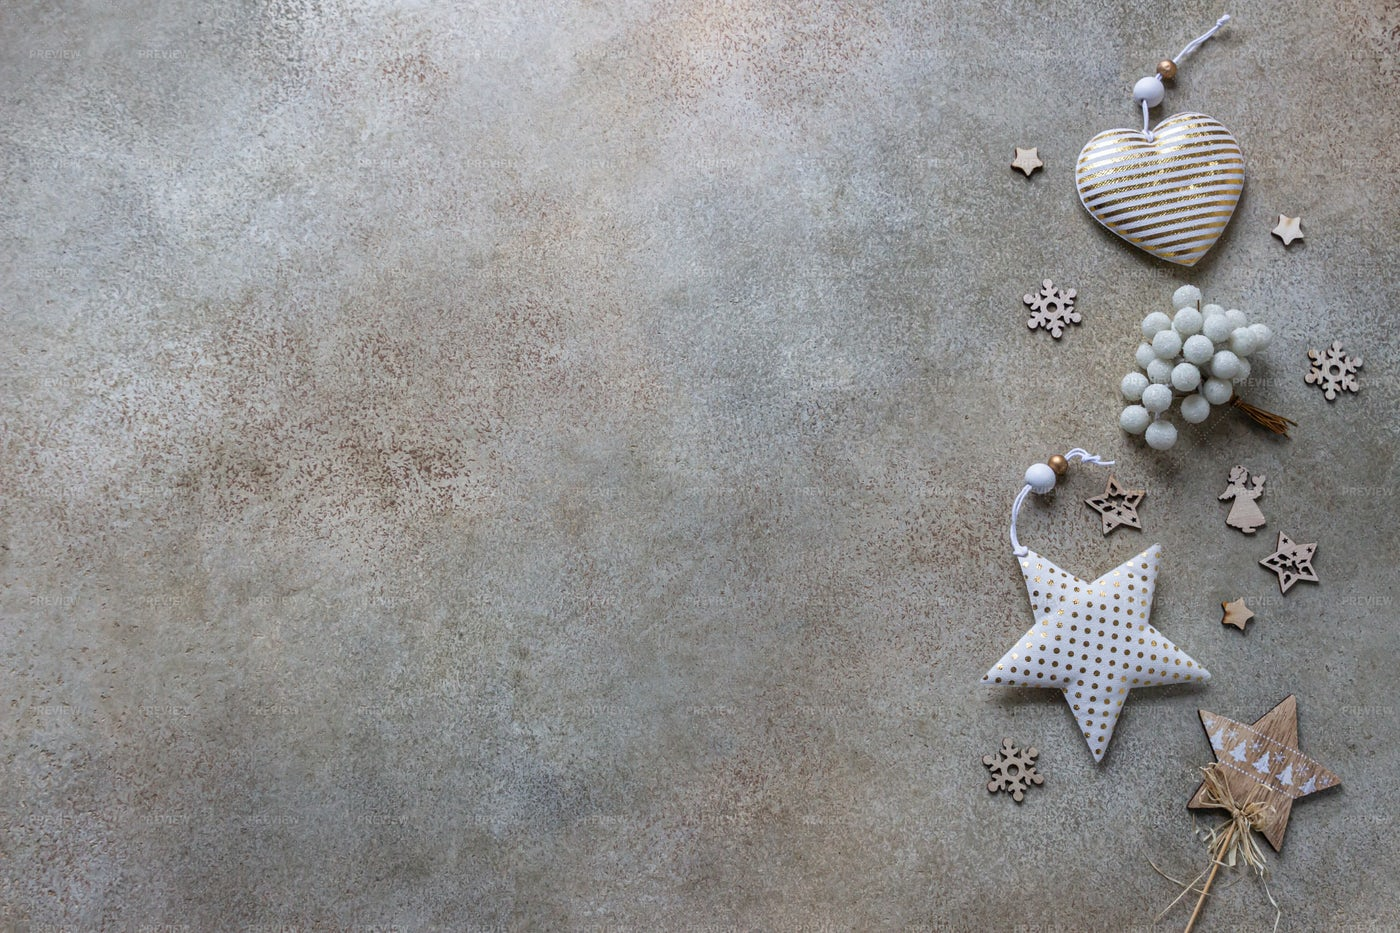 Eco-Friendly Christmas Decorations: Stock Photos